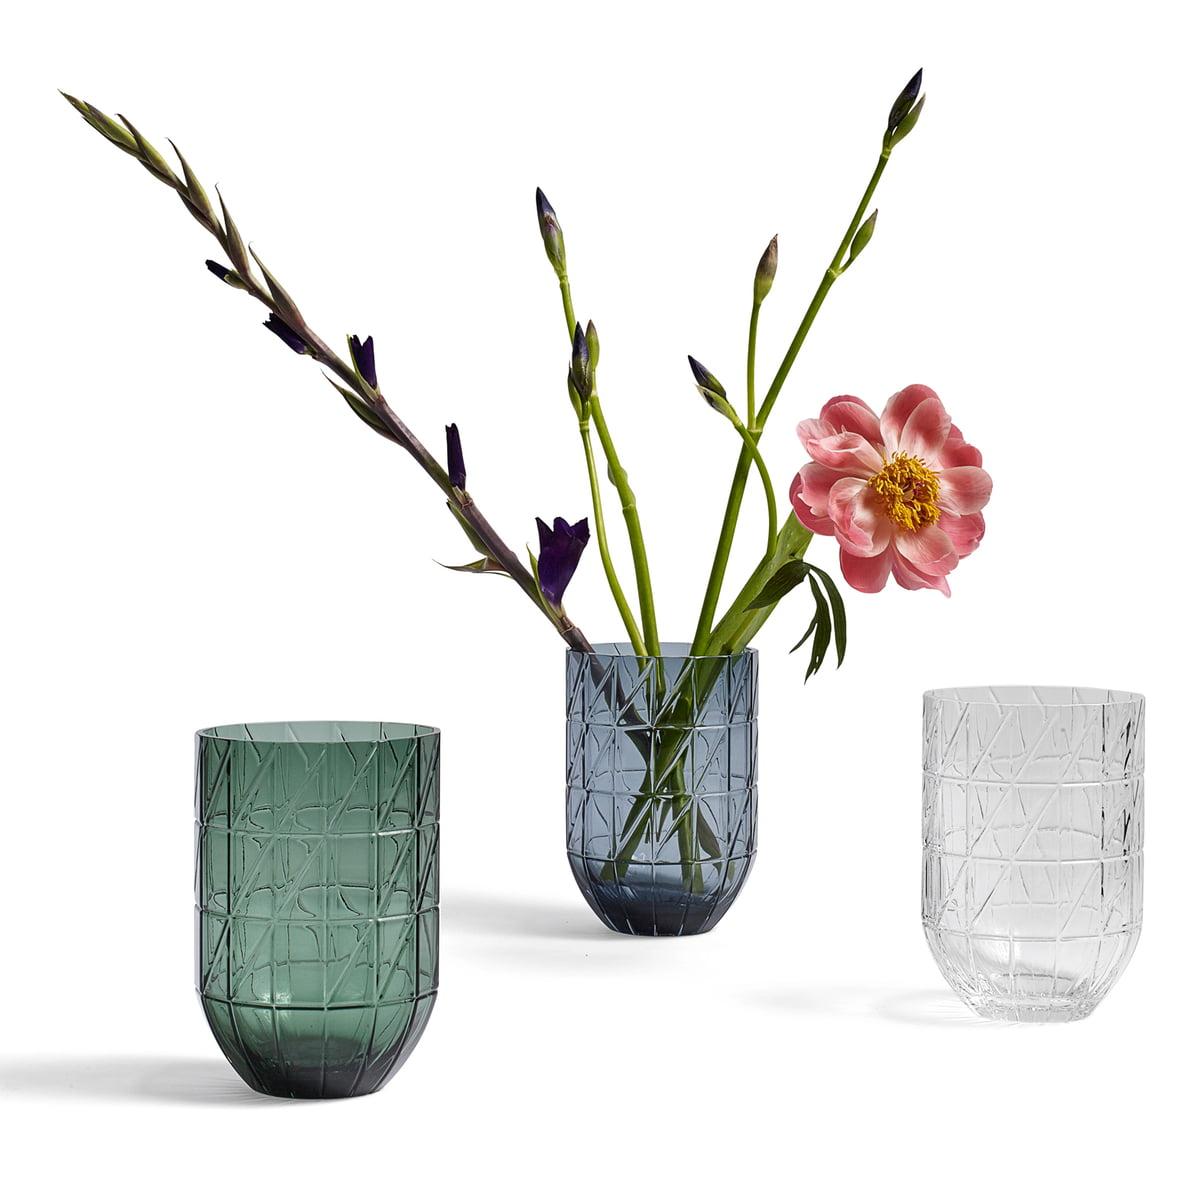 Christbaumkugeln Sterne.Hay Colour Vase Glasvase M Transparent